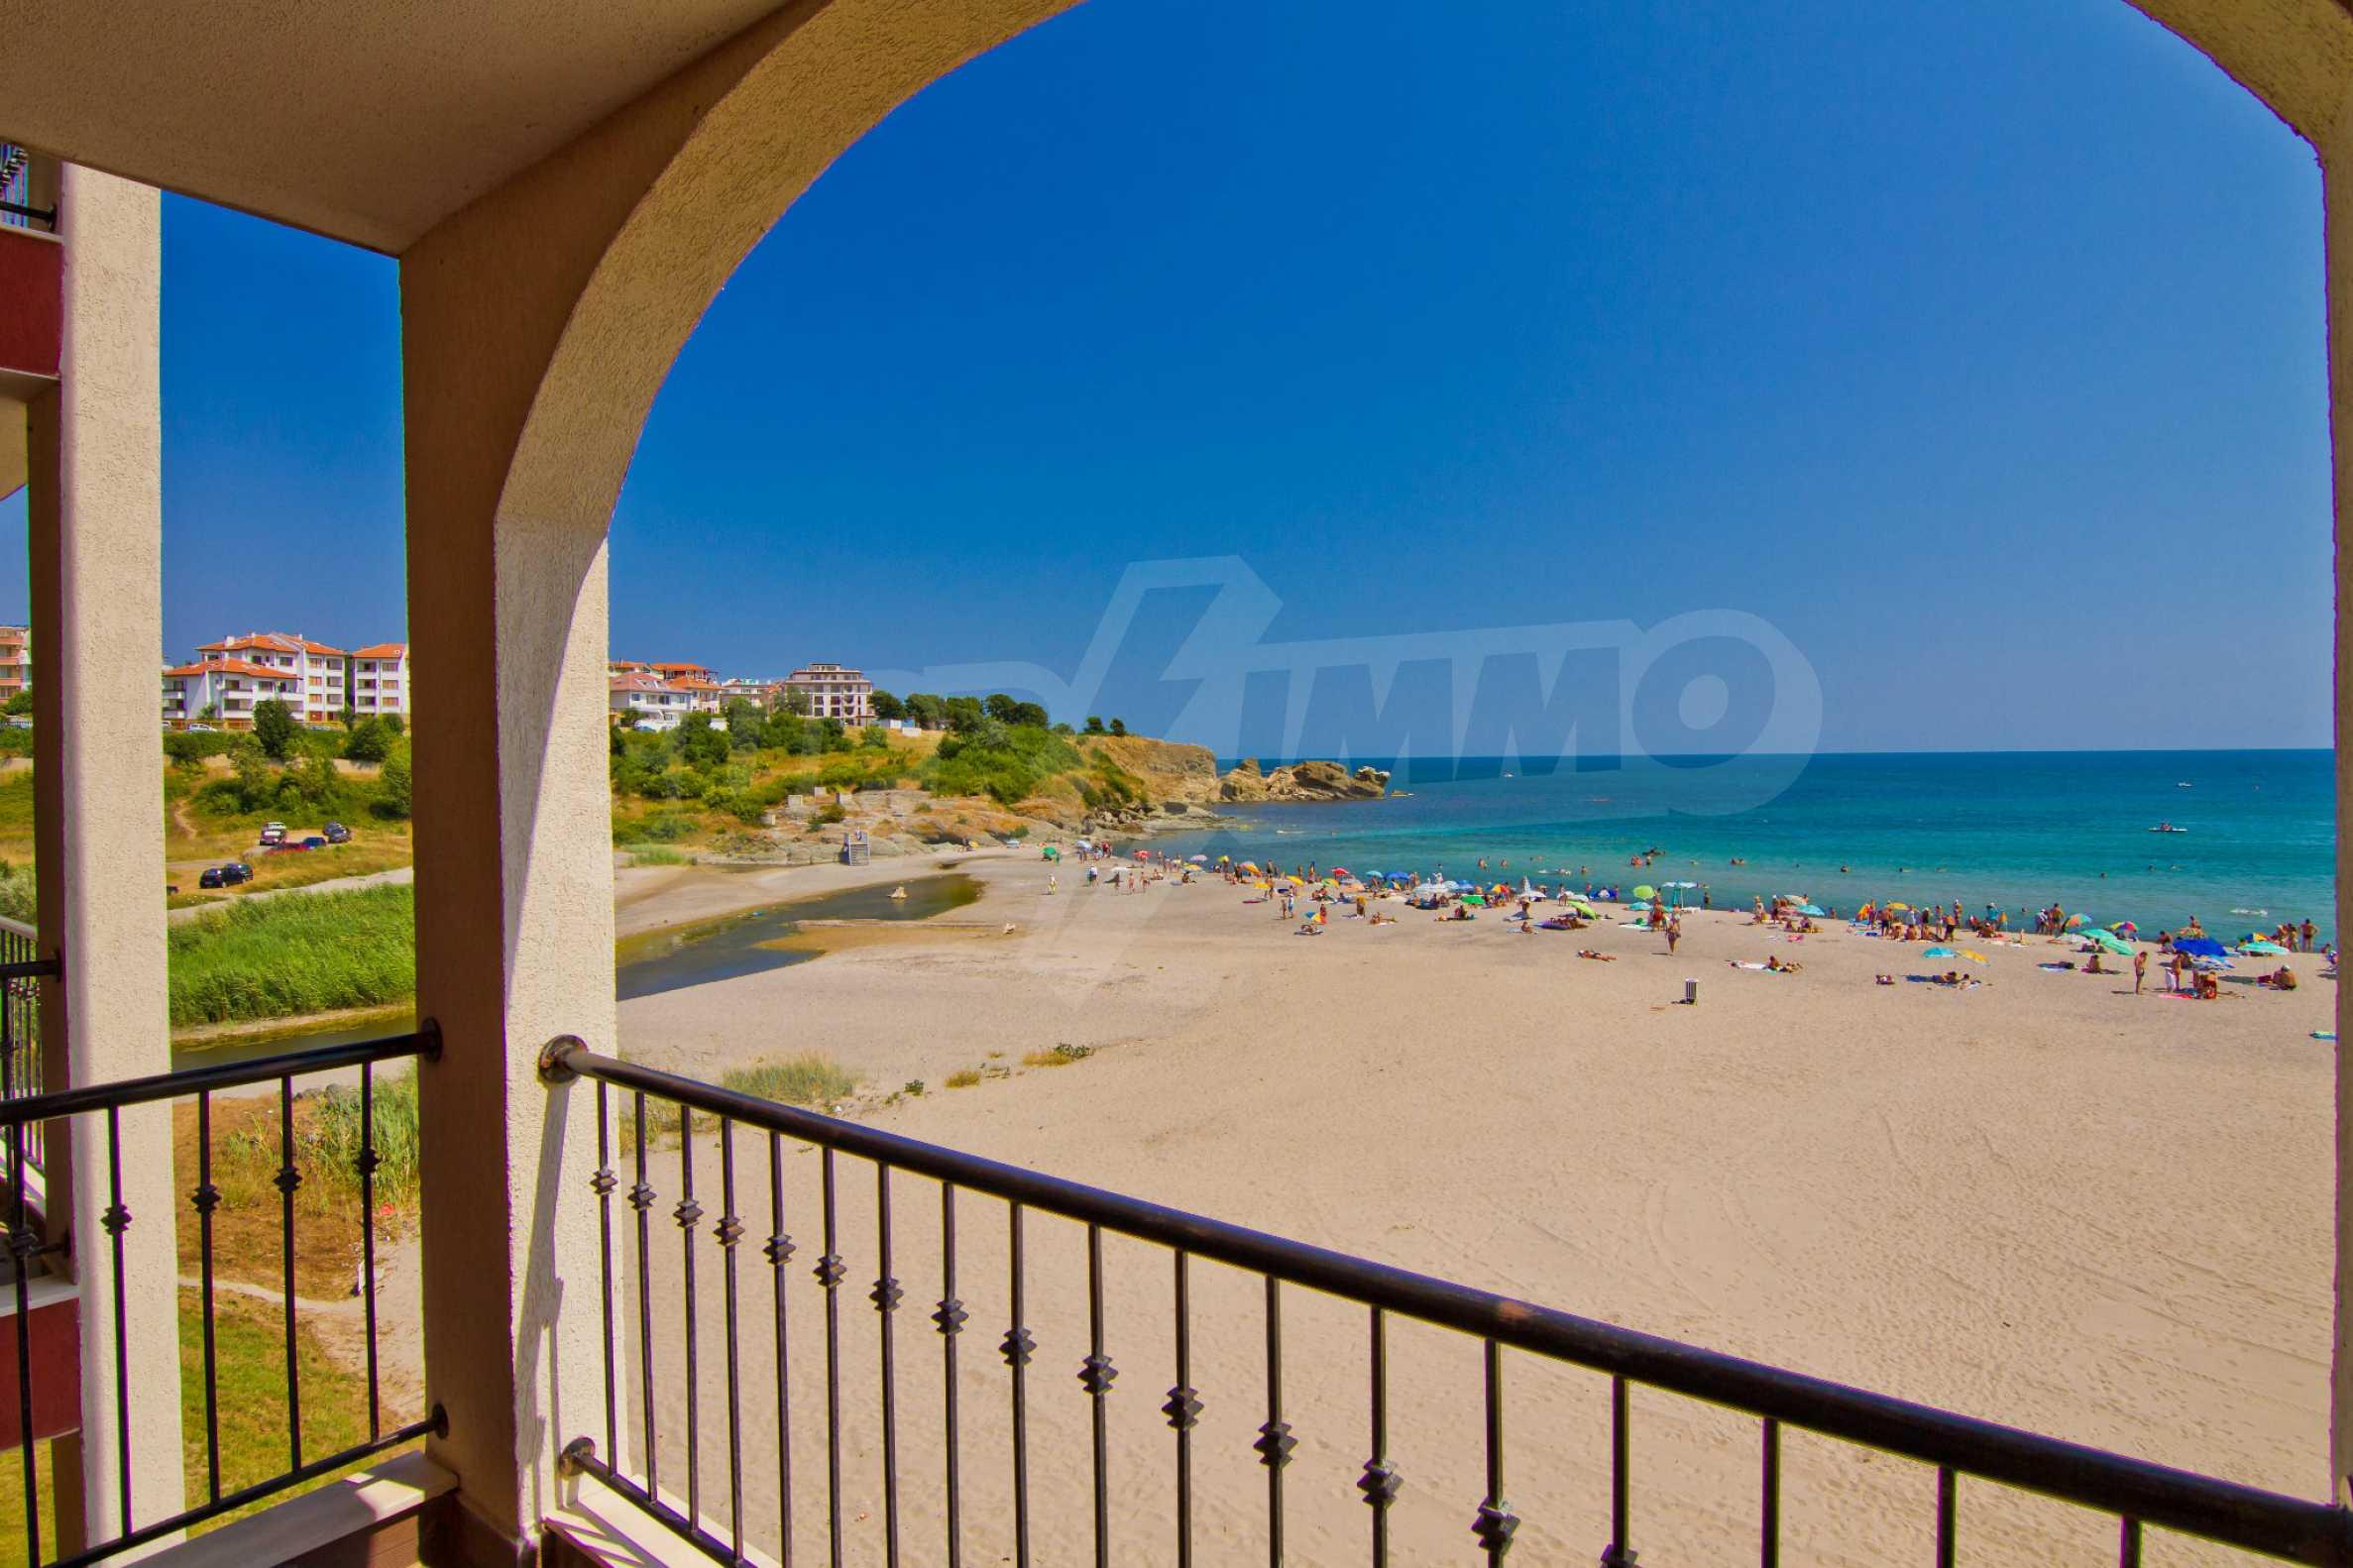 Примеа Бийч Резиденс / Primea Beach Residence 56